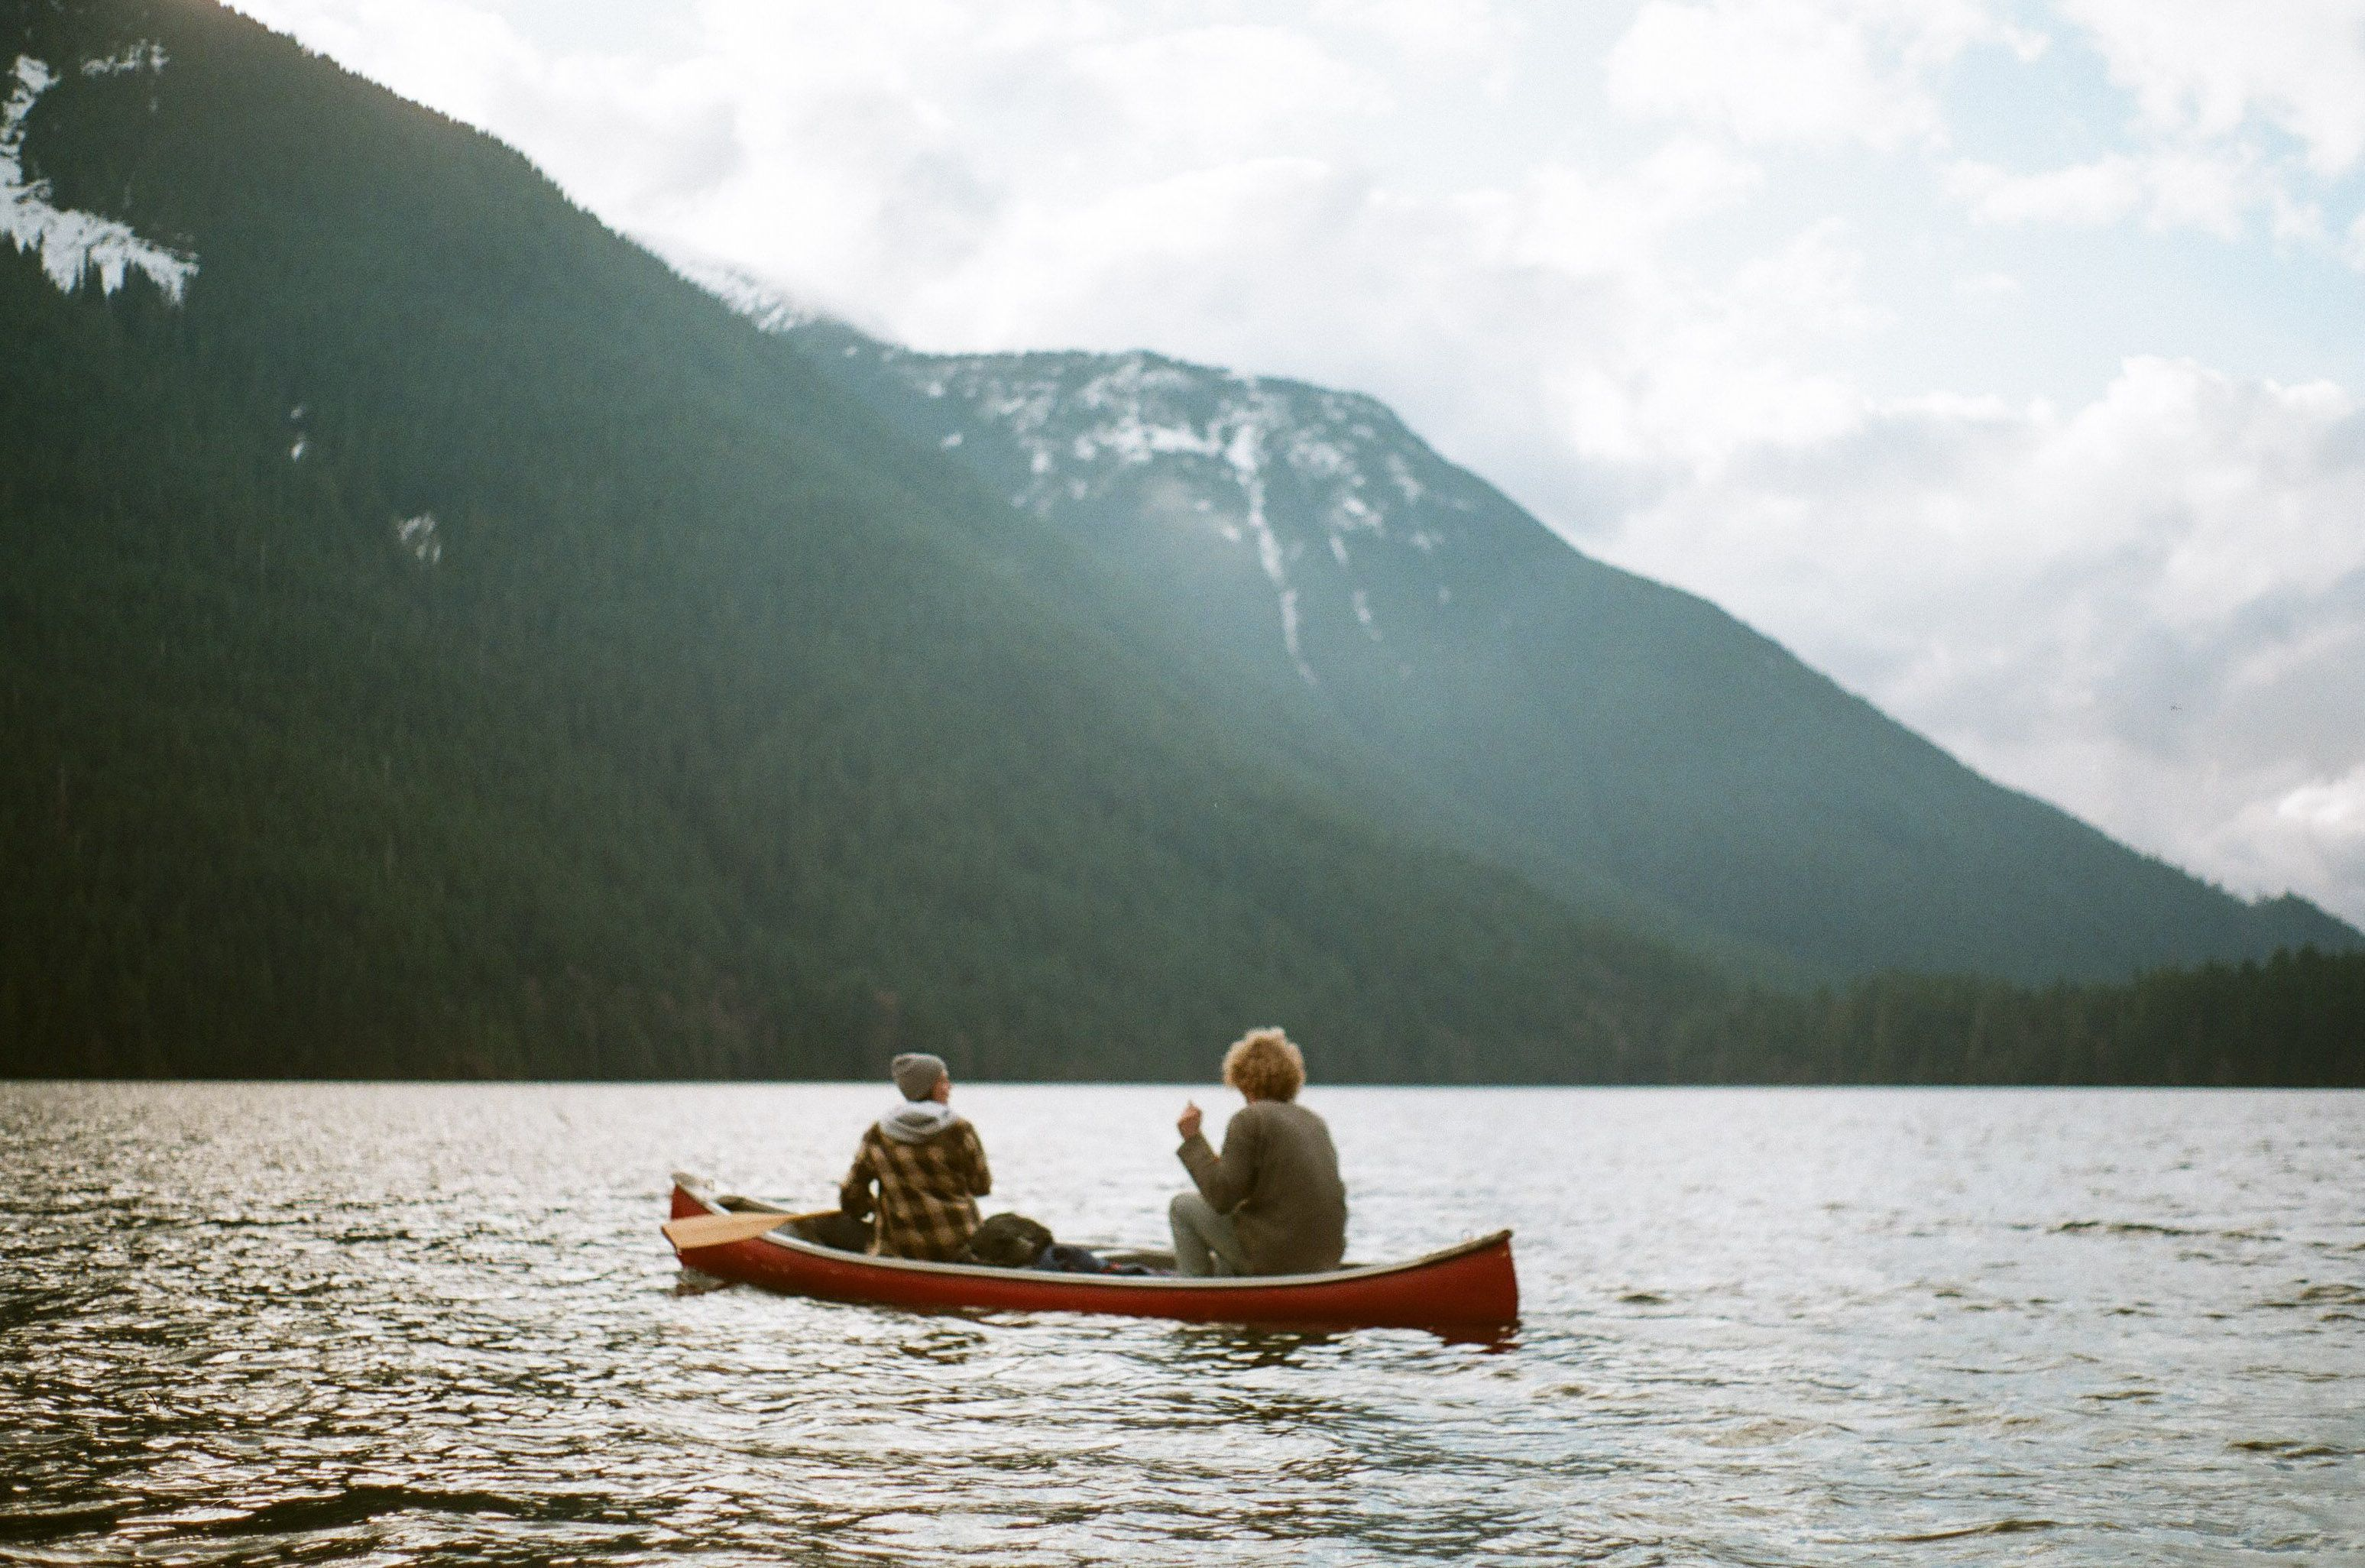 Winter canoeing on Chilliwack Lake - Canon AE-1 / Fuji film